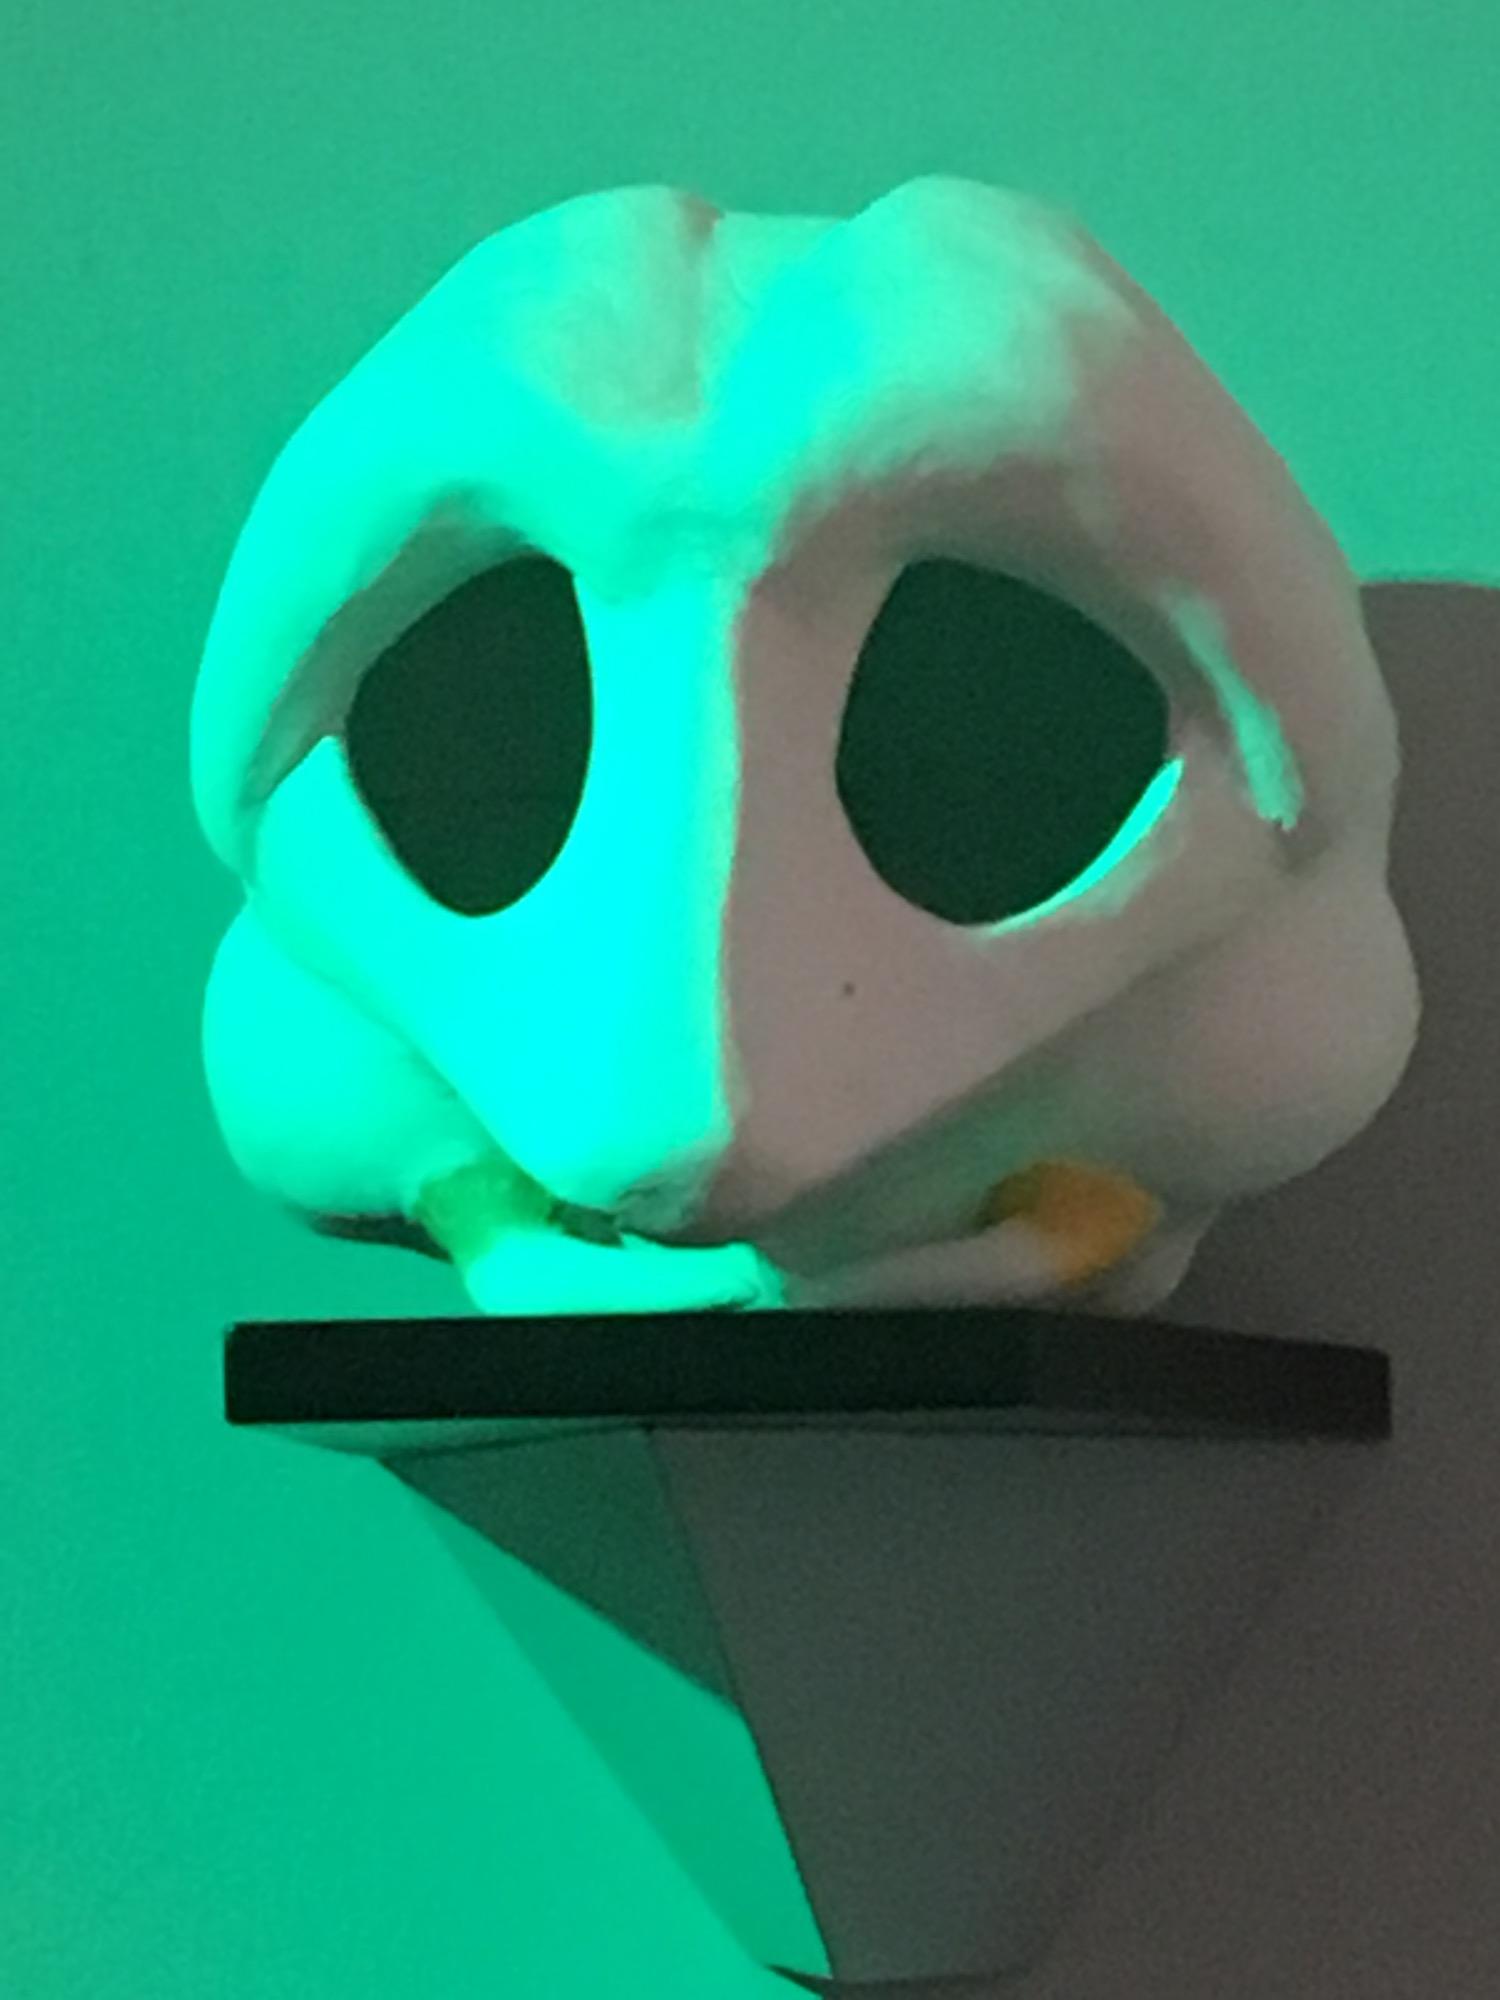 Alien Skull Inside Doctor McCoy's Office ©2017 David R. George III